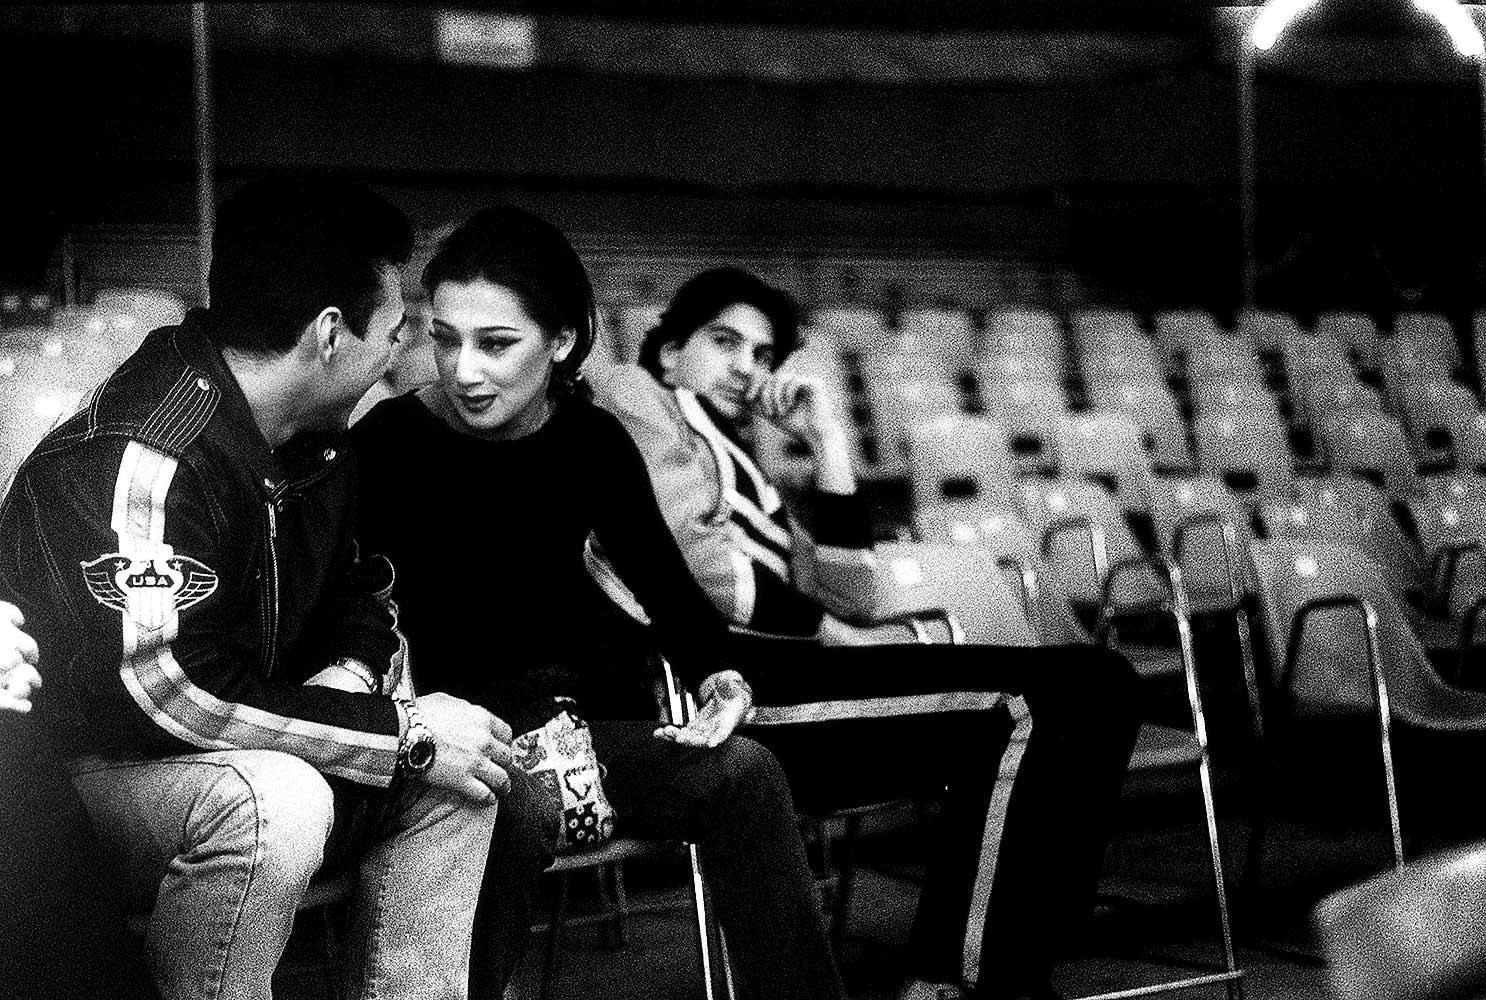 CIRCUS LIFE - Everynight, all around the world - Miguel and Ingrid Around Italy, 1999